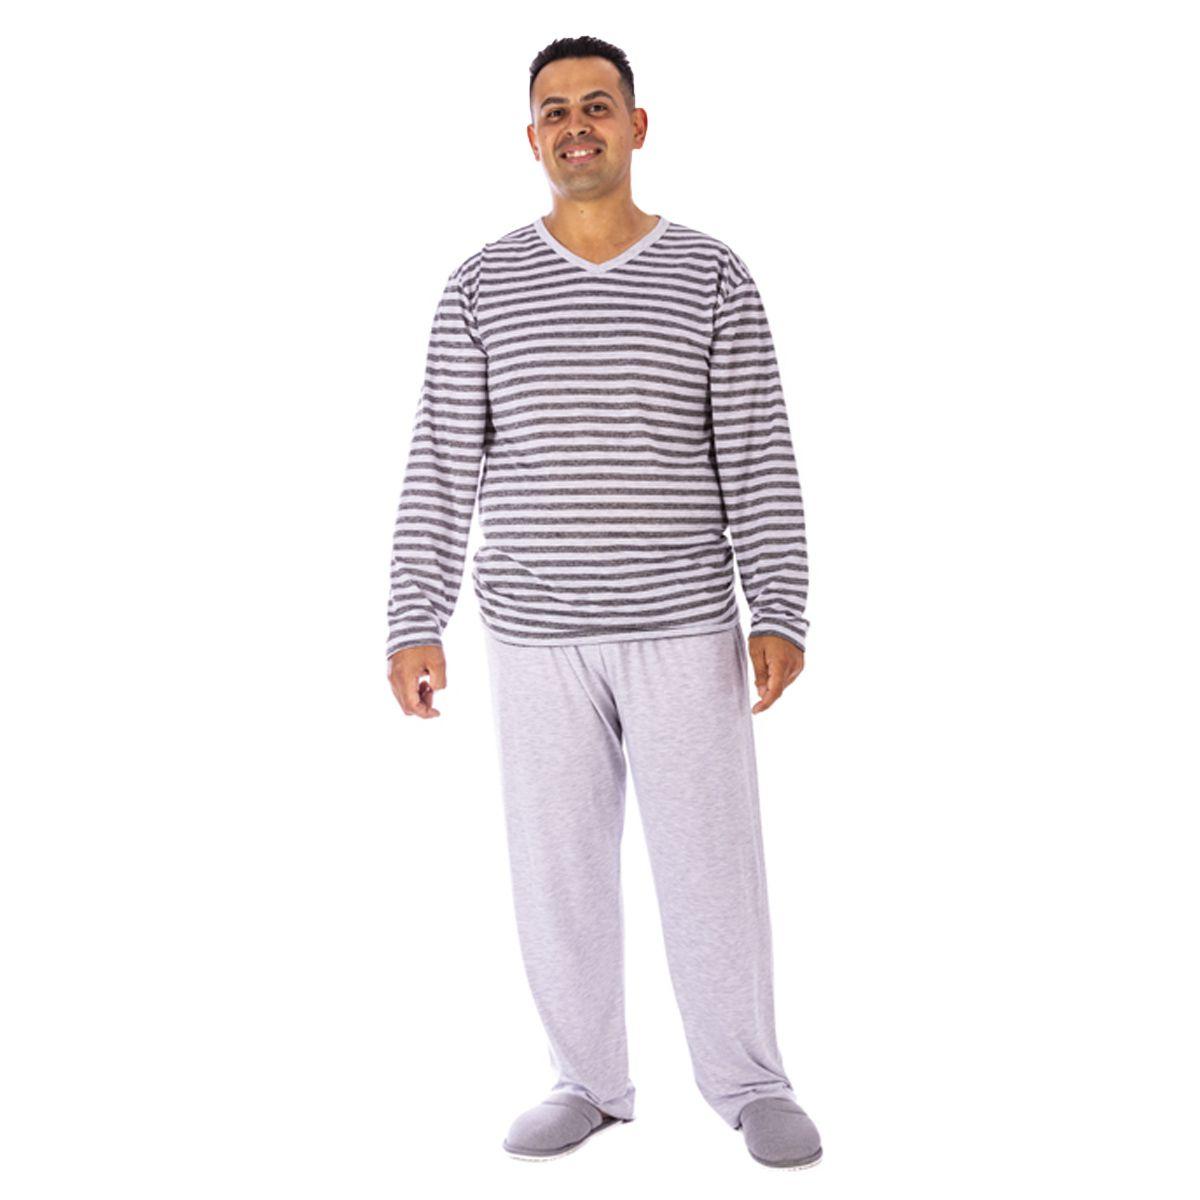 Pijama de Inverno Masculino meia malha plus size Victory